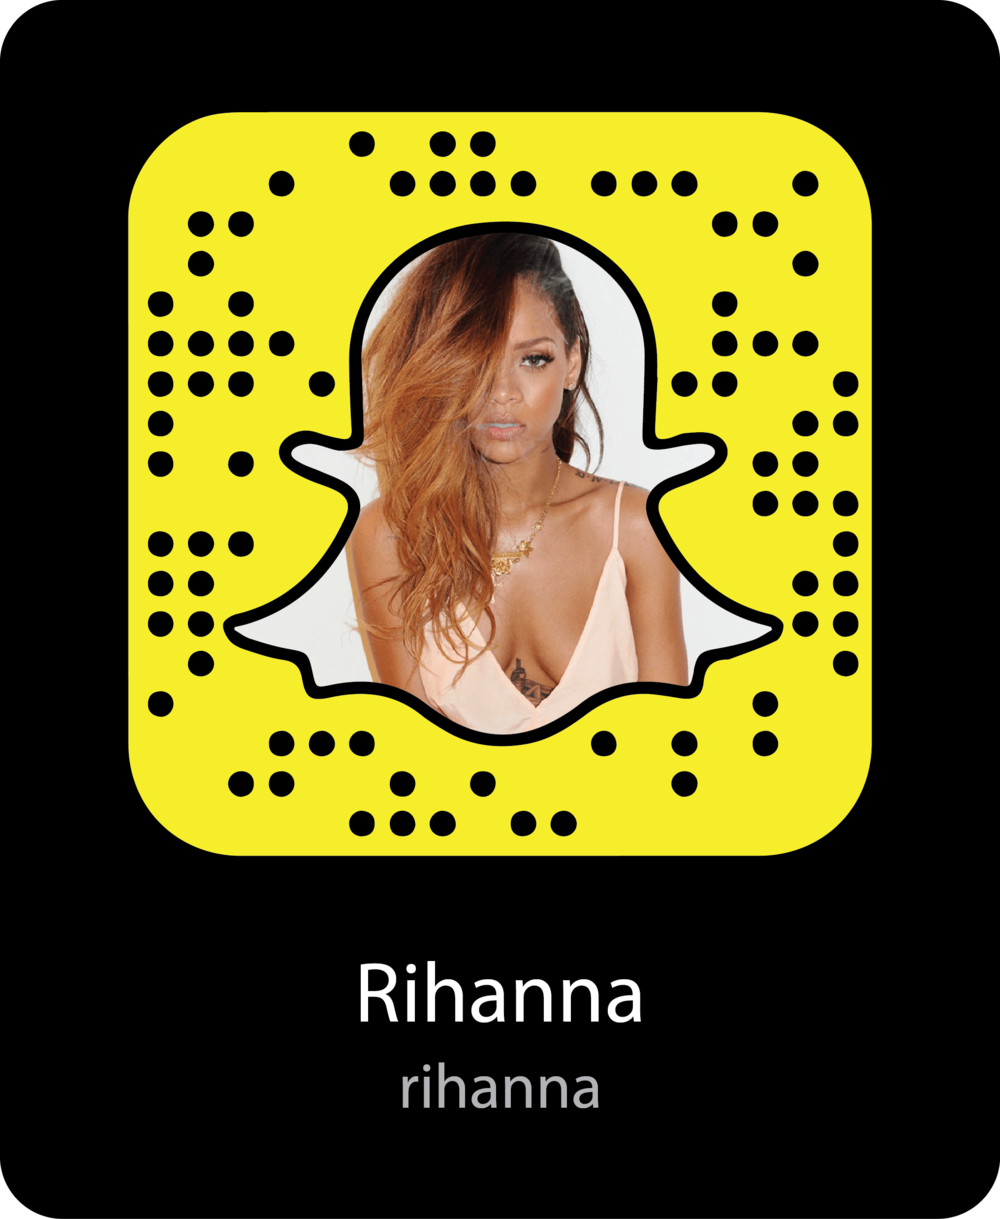 rihanna-celebrity-snapchat-snapcode